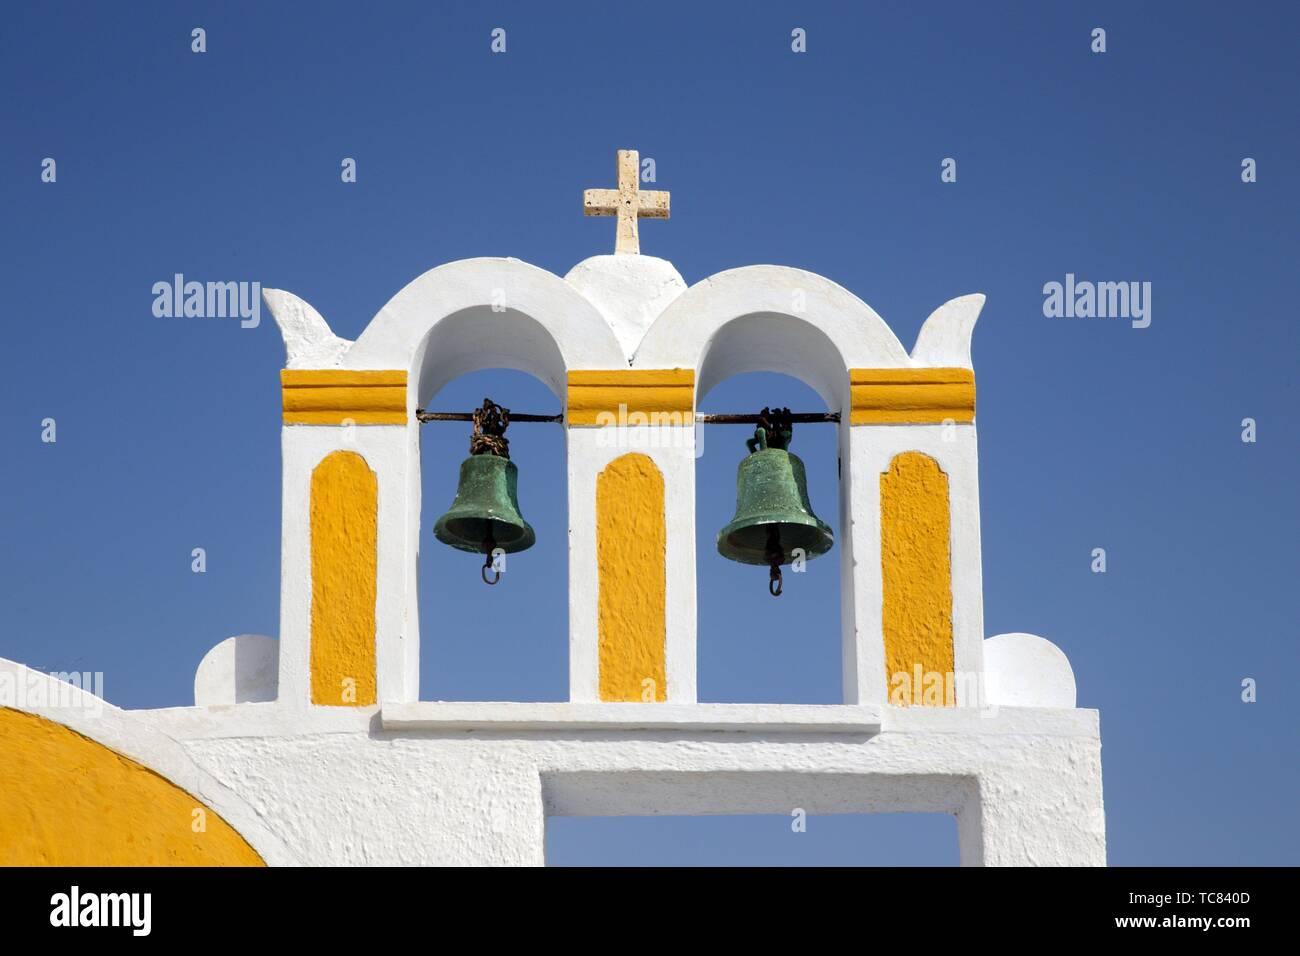 Glockenturm einer Kirche in Oia, Santorin, Griechenland, Europa. Stockfoto